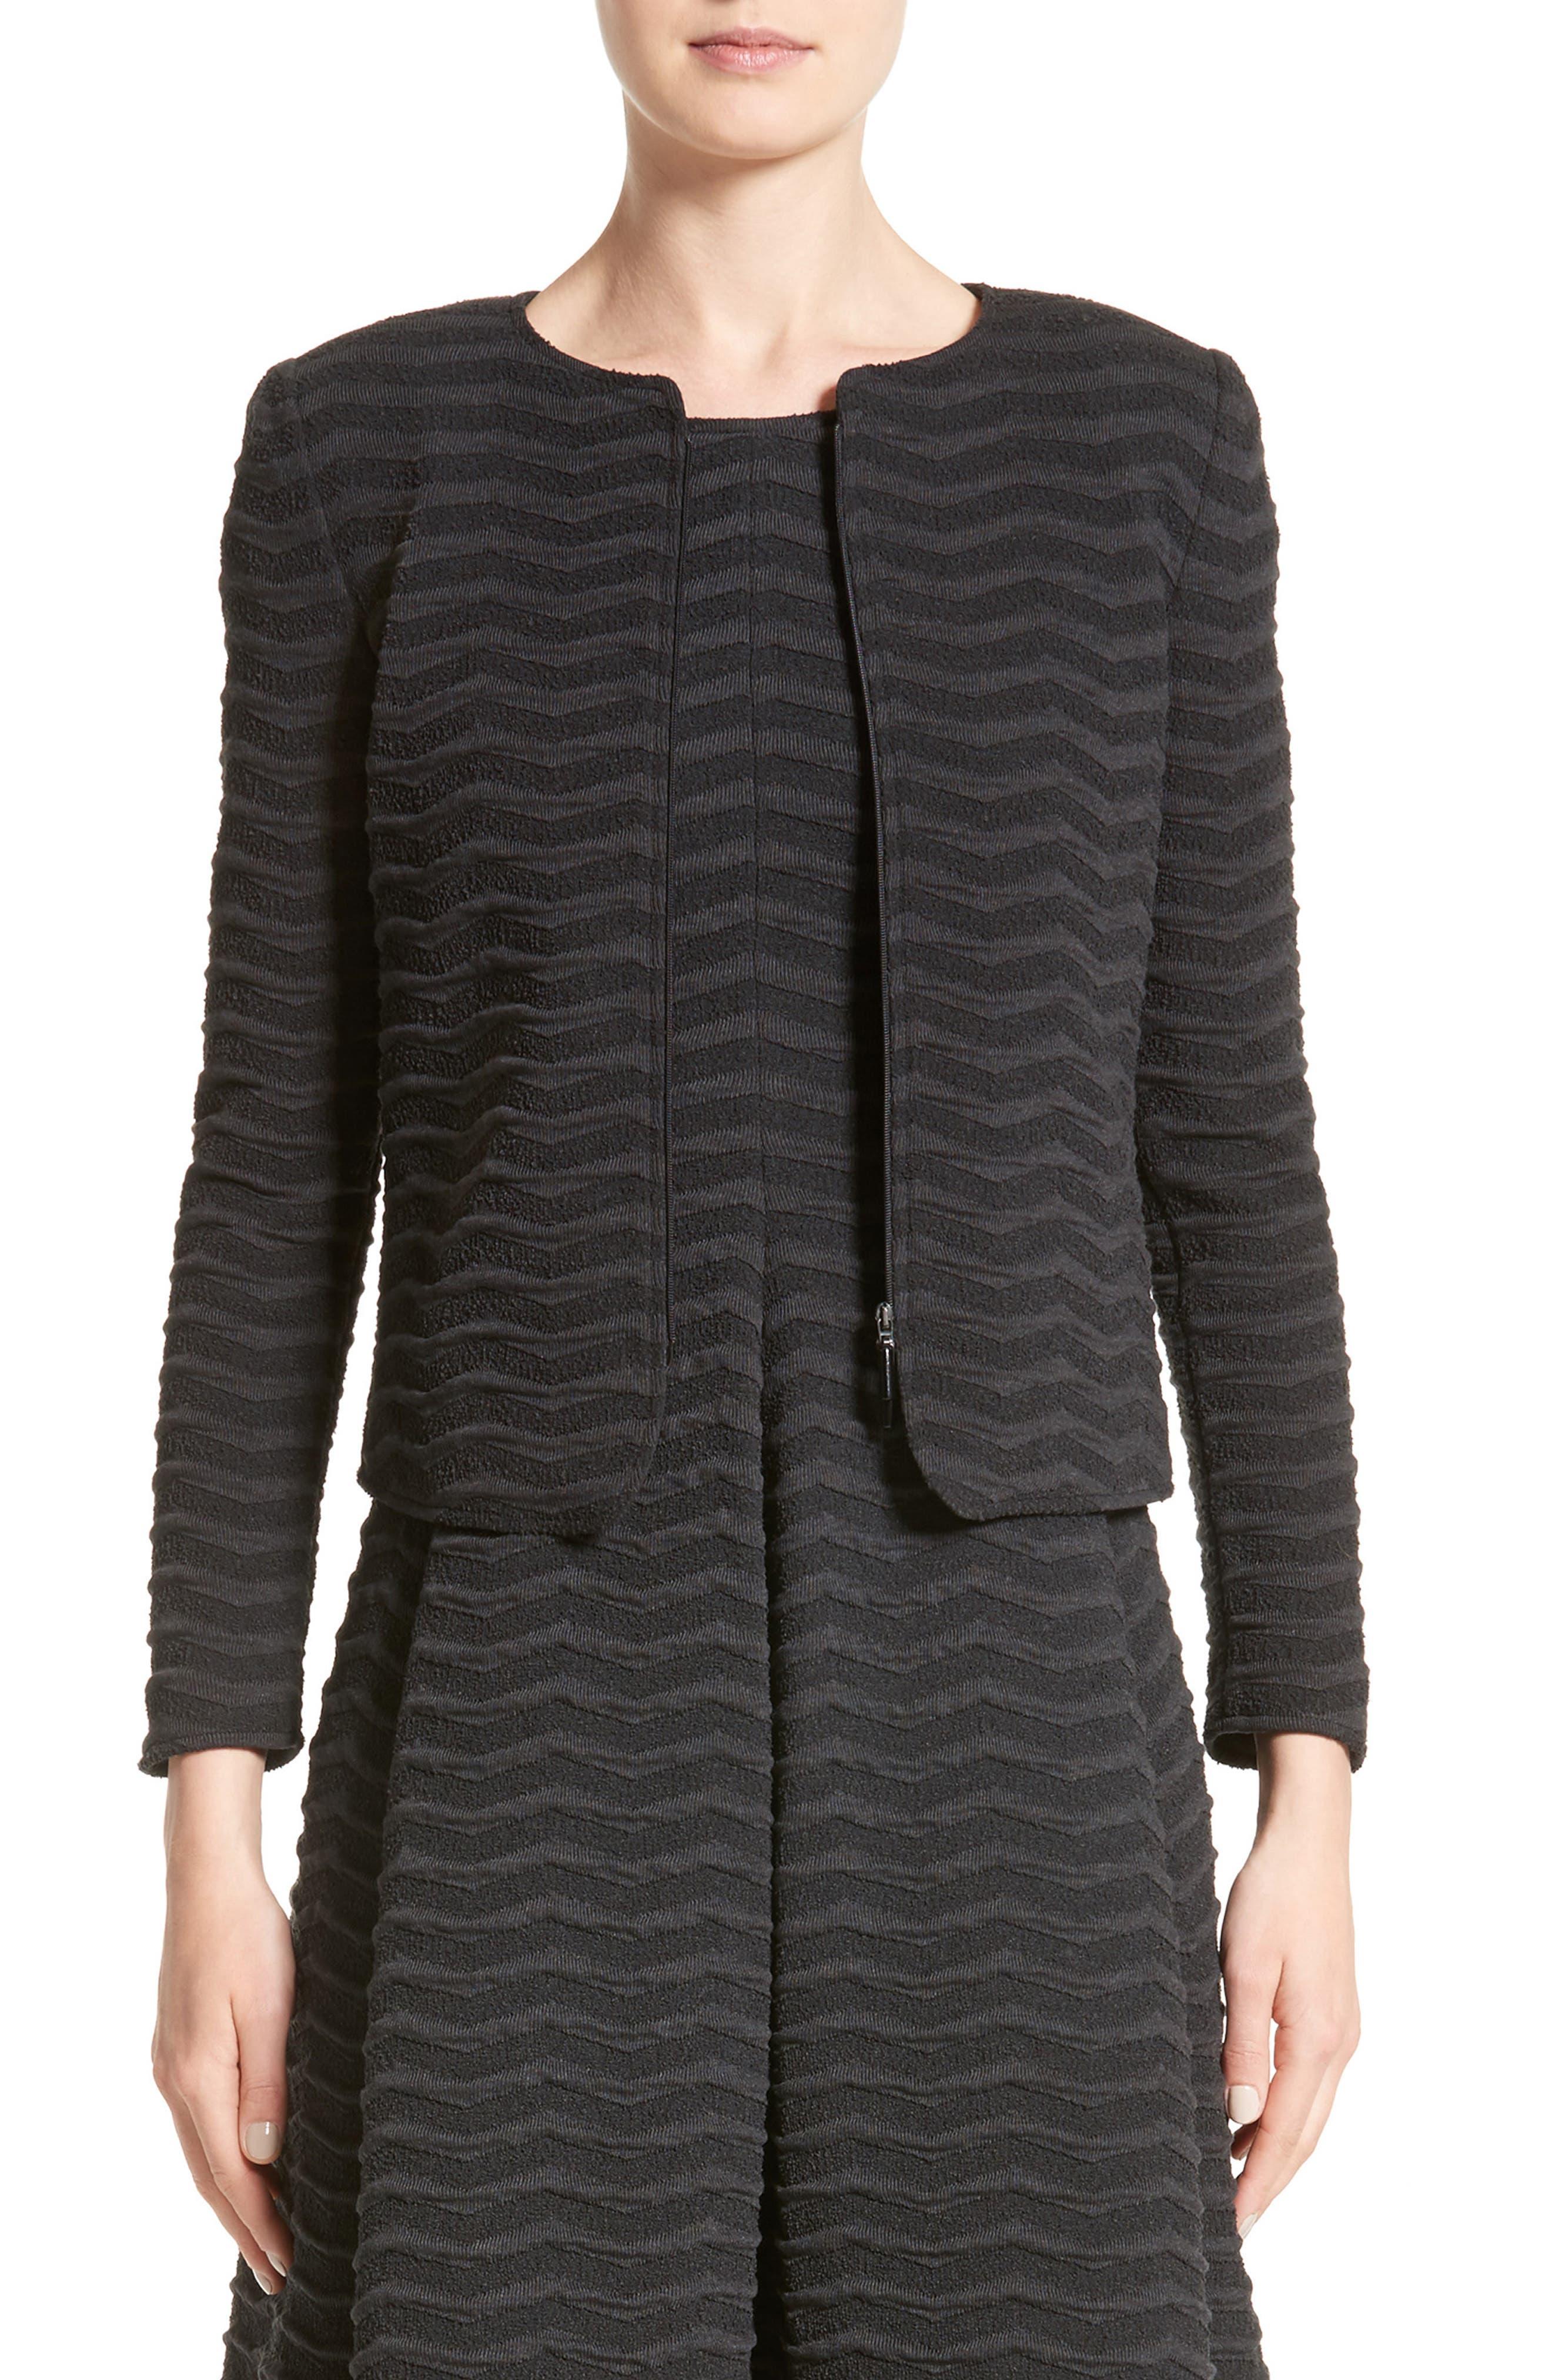 Main Image - Armani Collezioni Embossed Jacquard Jersey Jacket